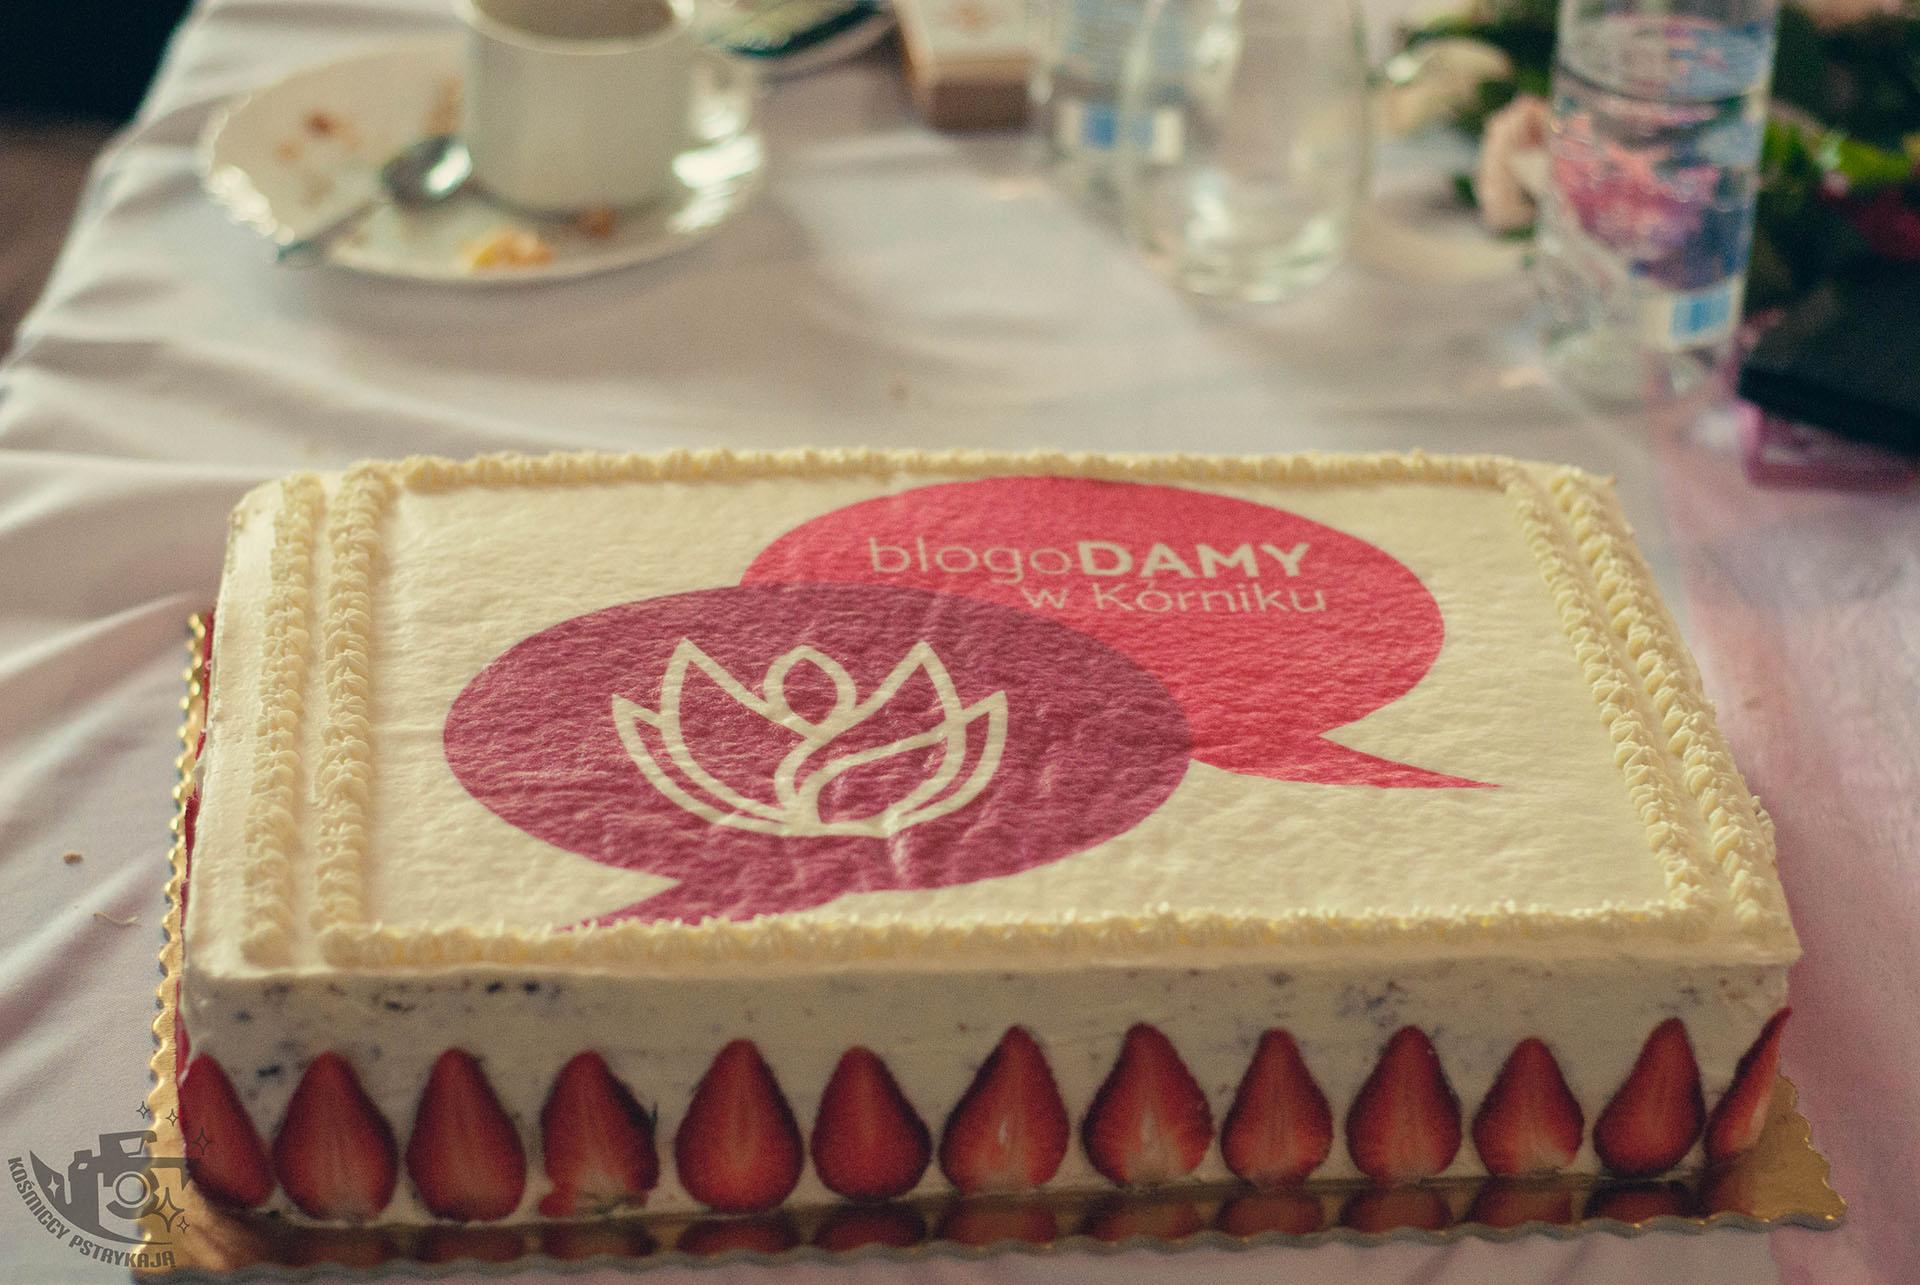 BlogoDamy w Kórniku tort